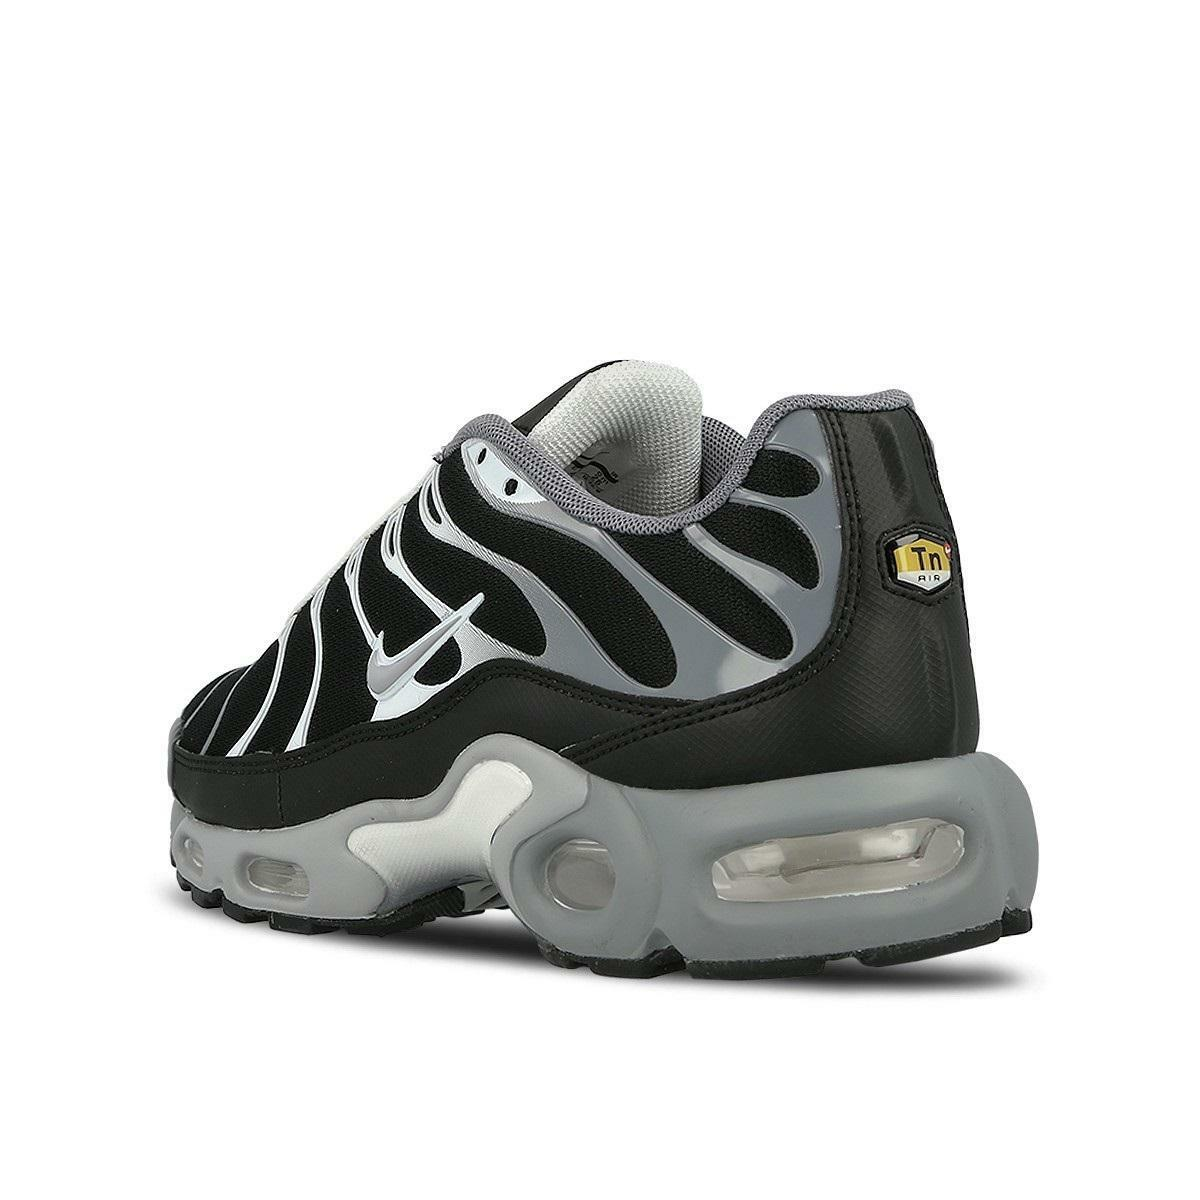 Herren Nike Air Max Plus Cool Grau Turnschuhe 852630 010